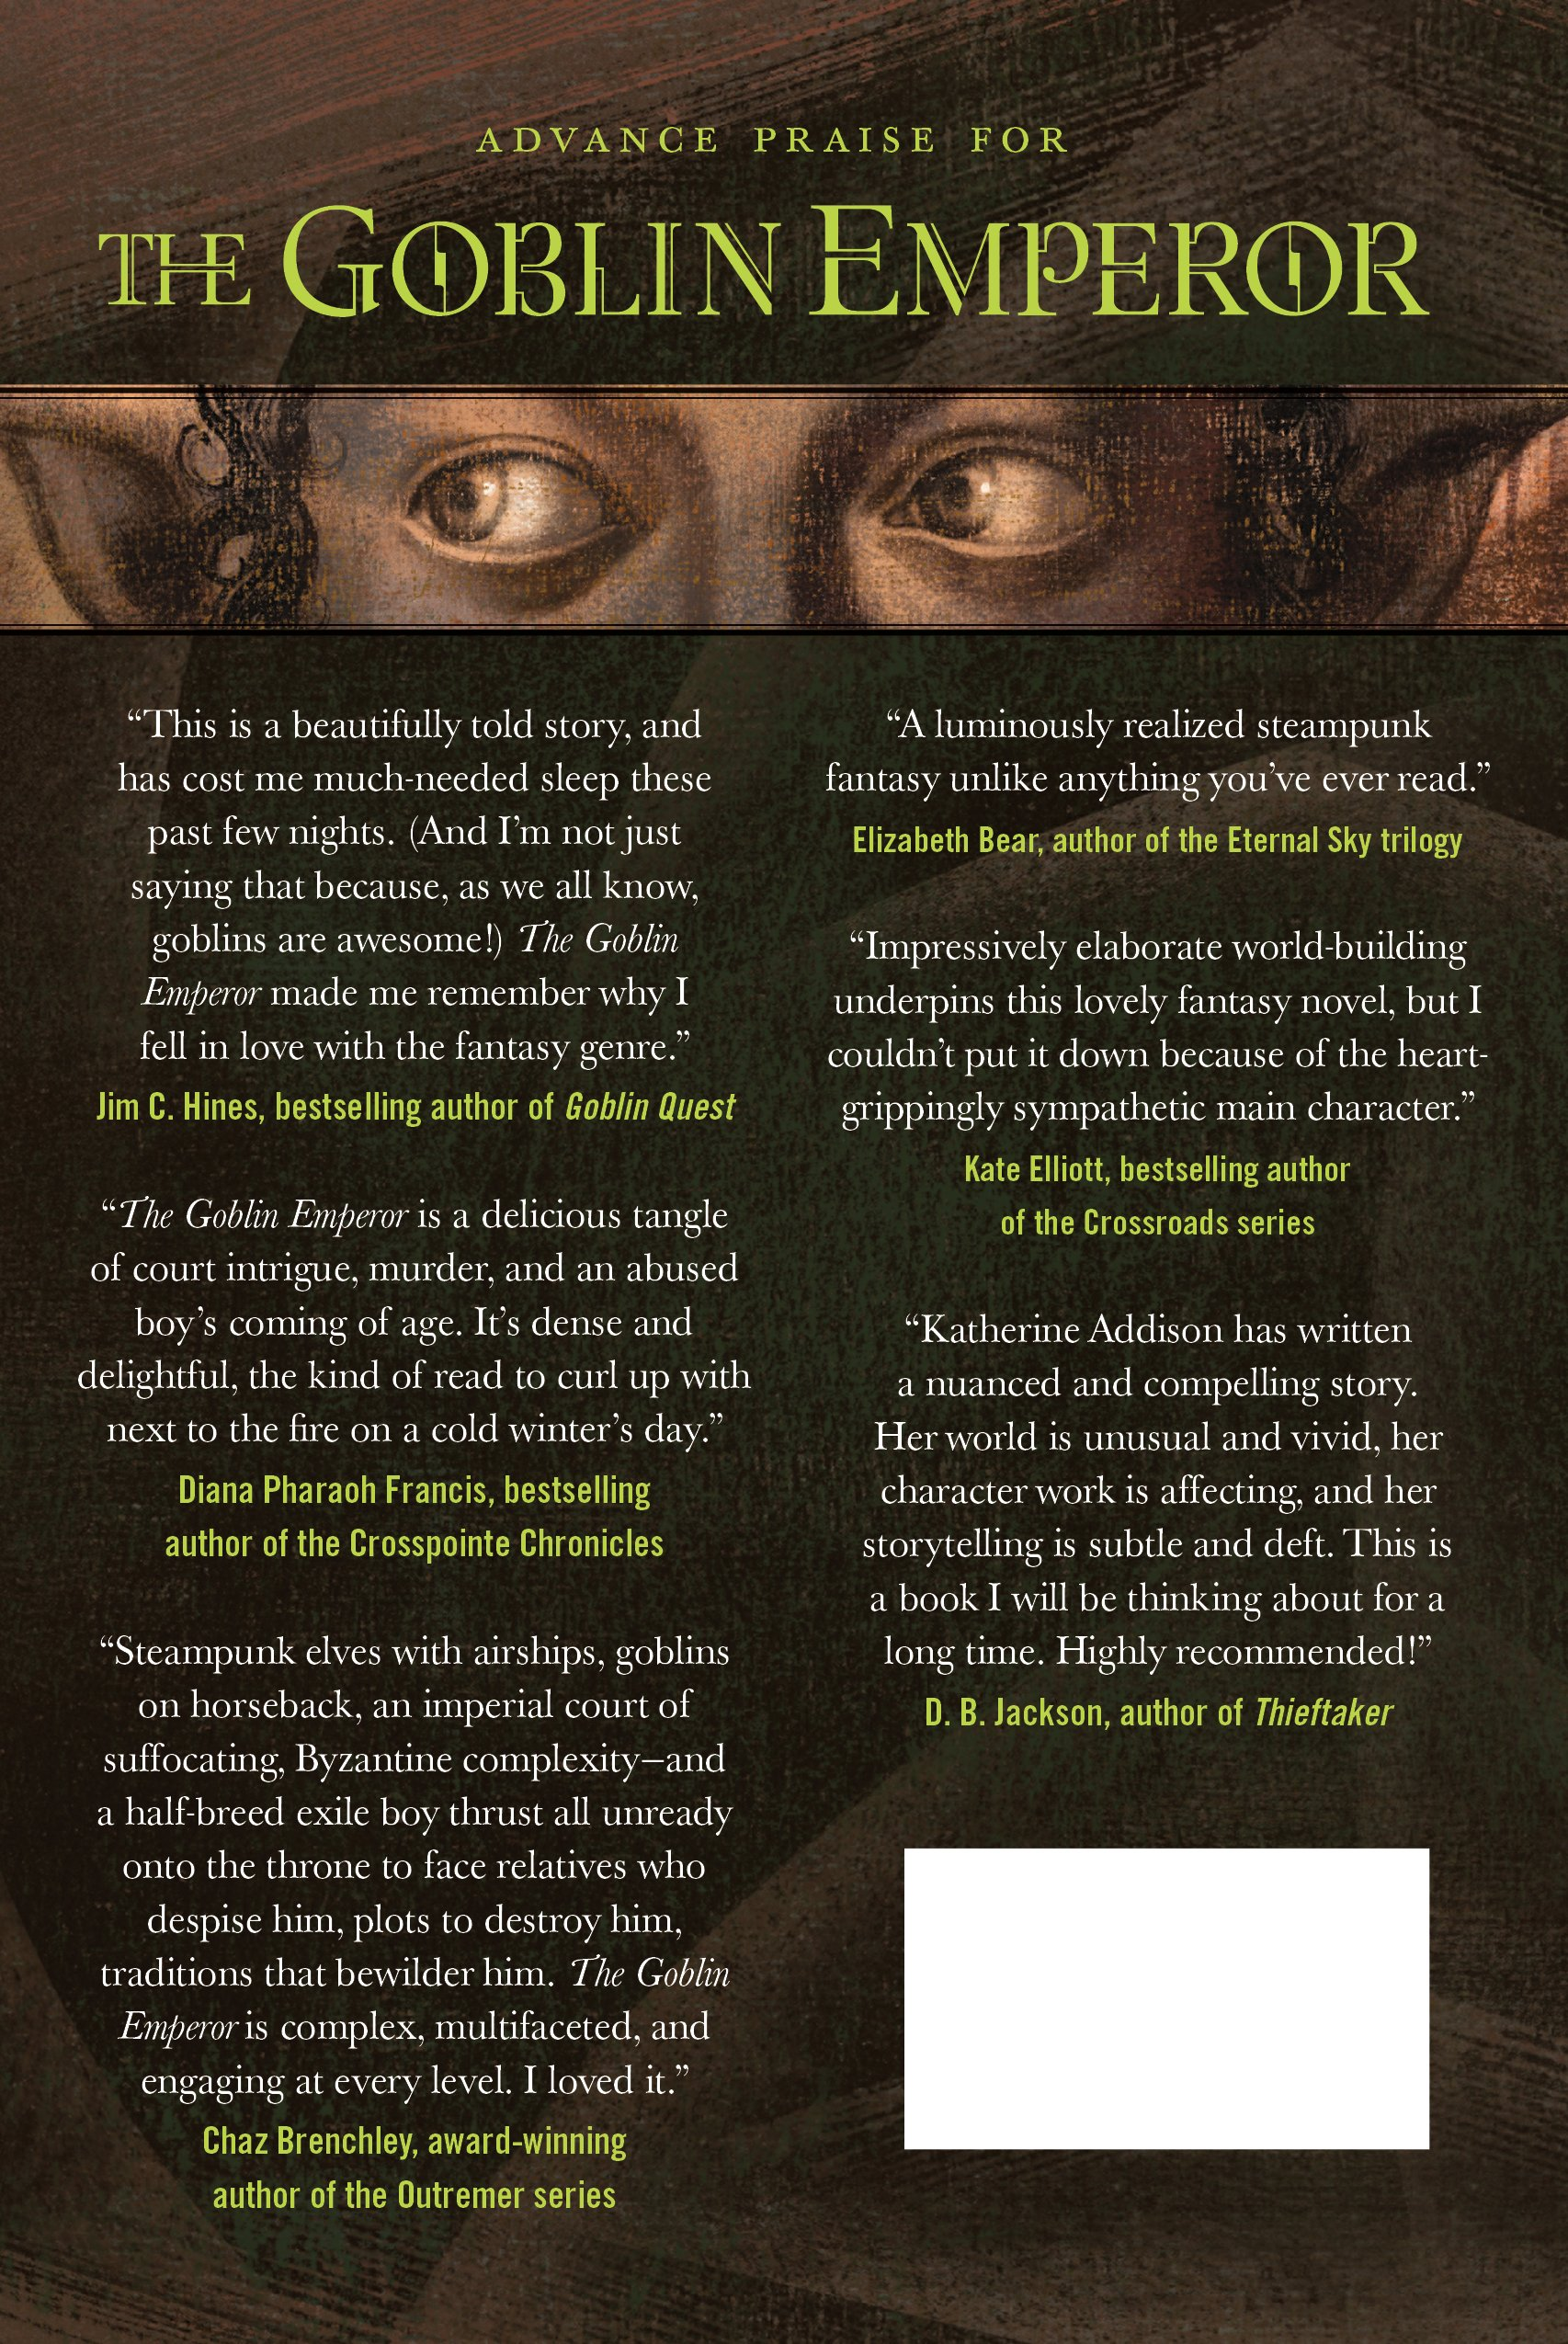 The Goblin Emperor: Katherine Addison: 9780765326997: Amazon: Books